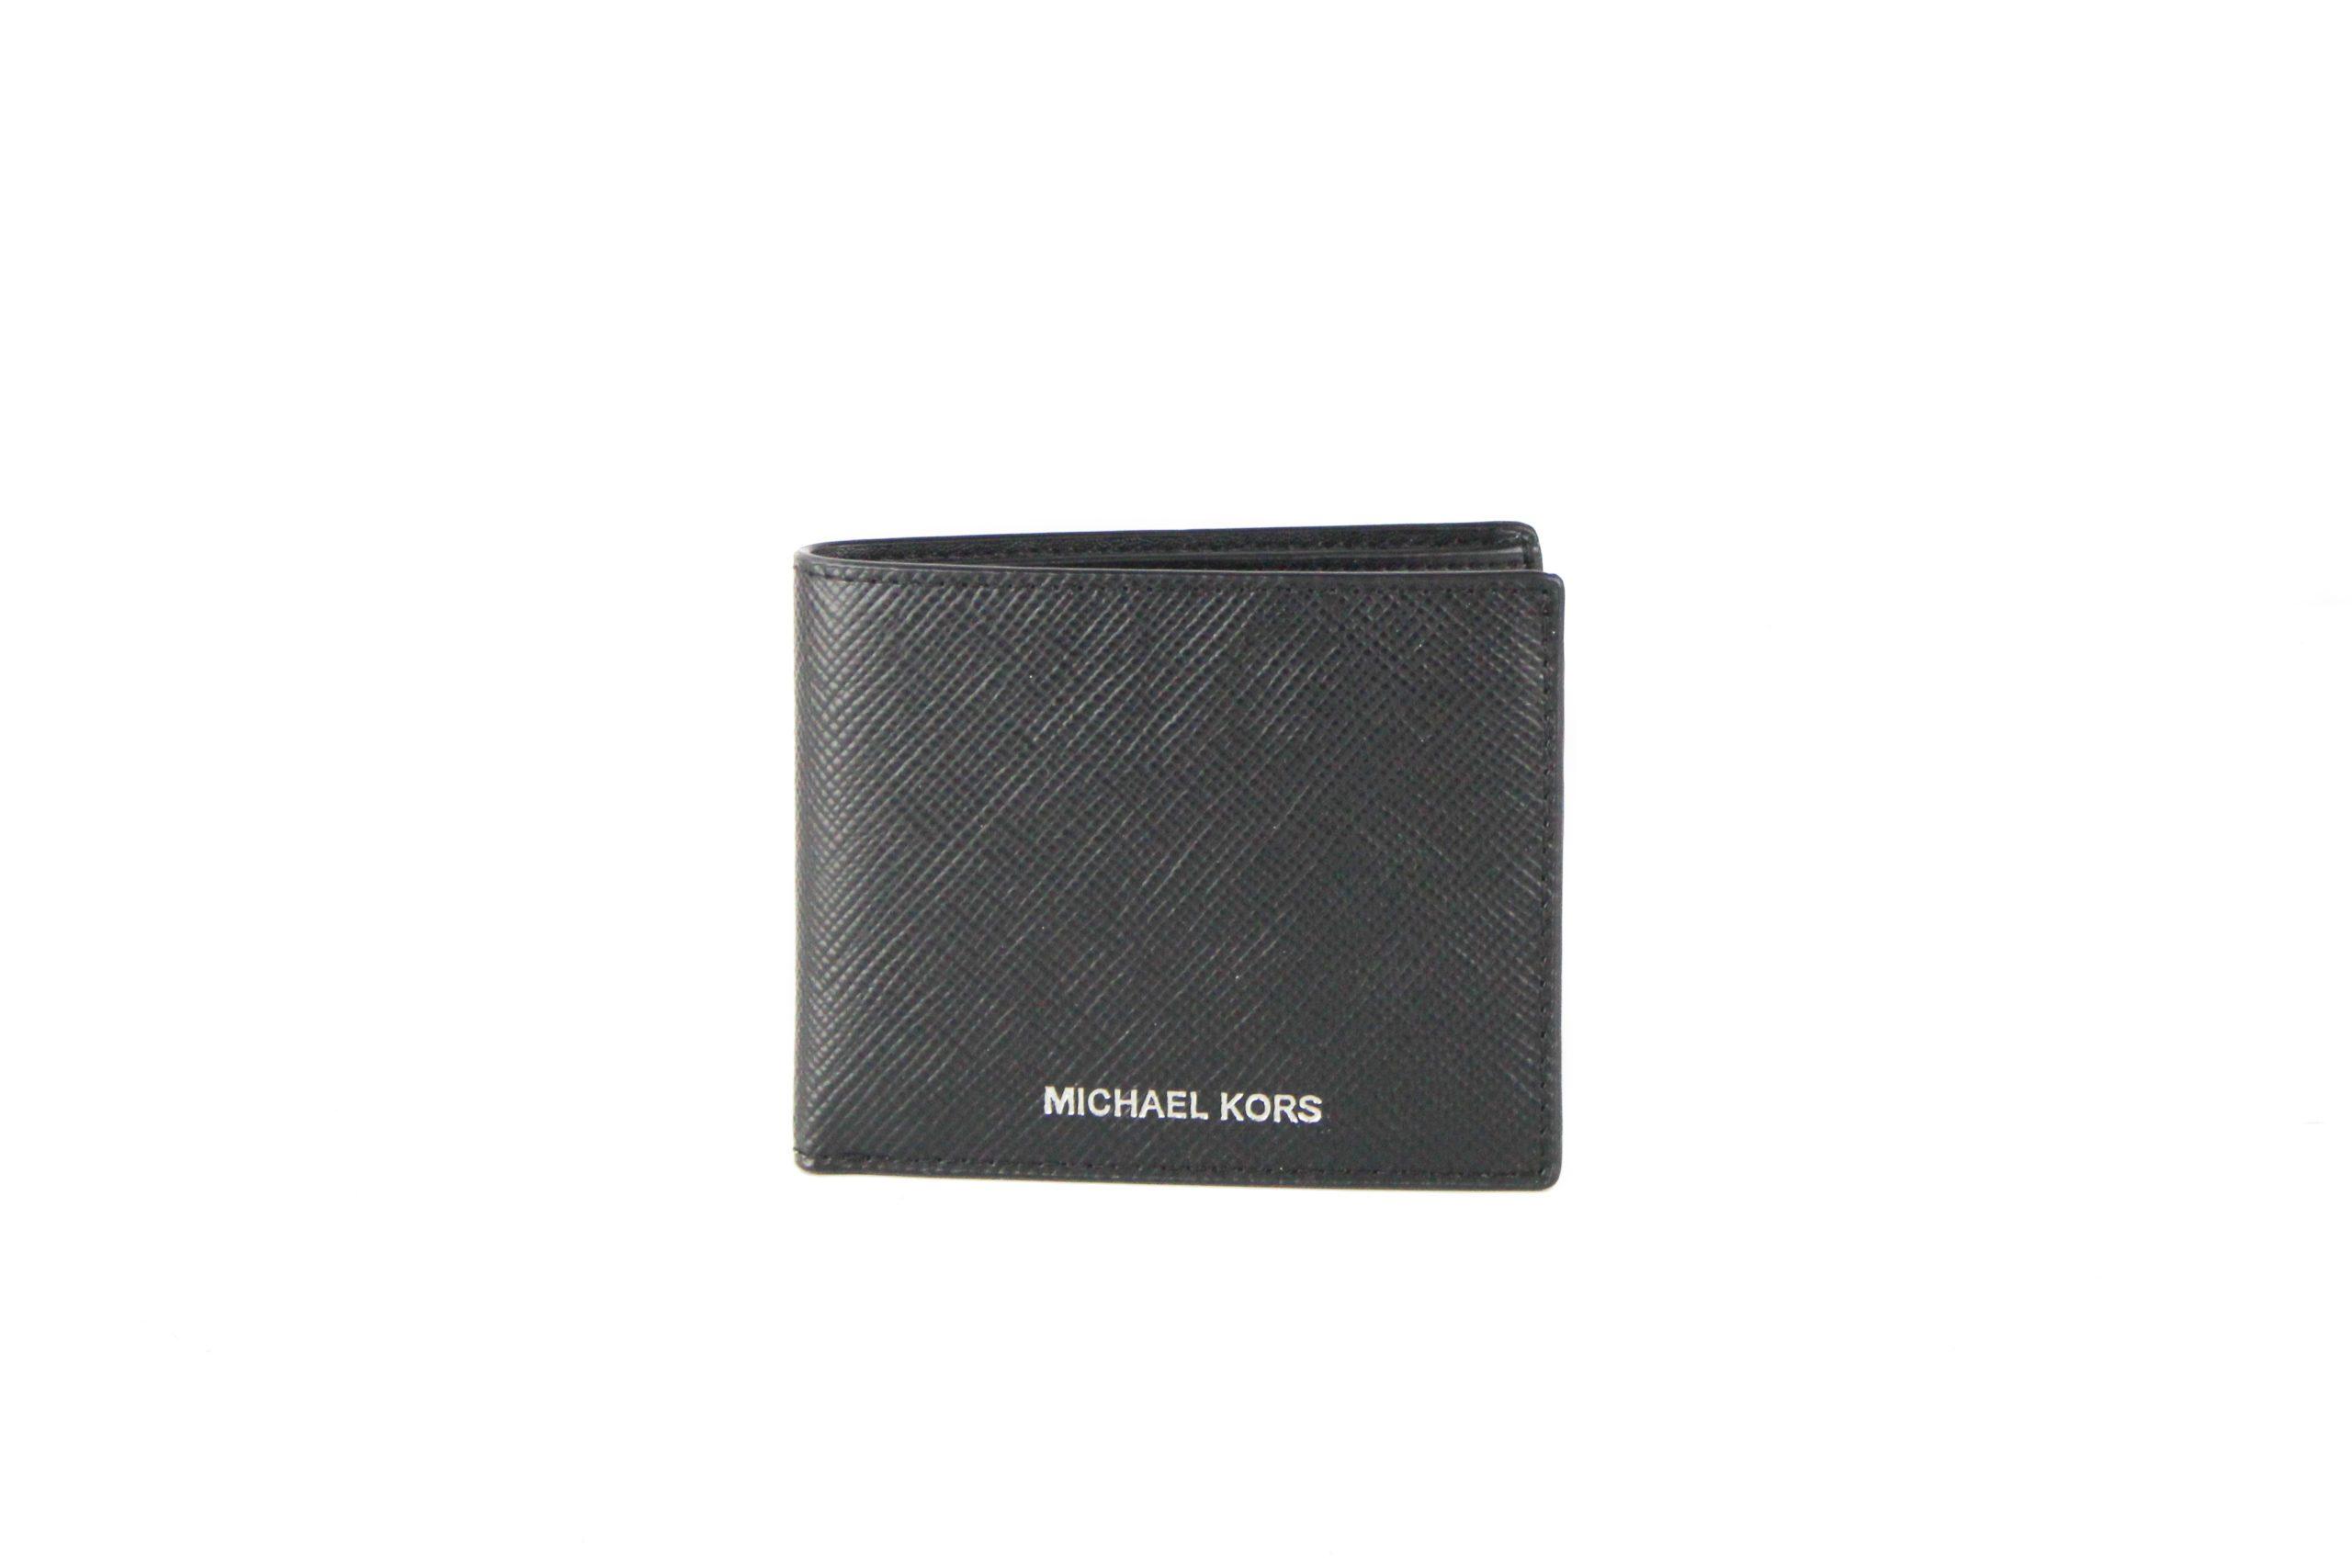 Michael Kors Men's Harrison Wallet Black 49153